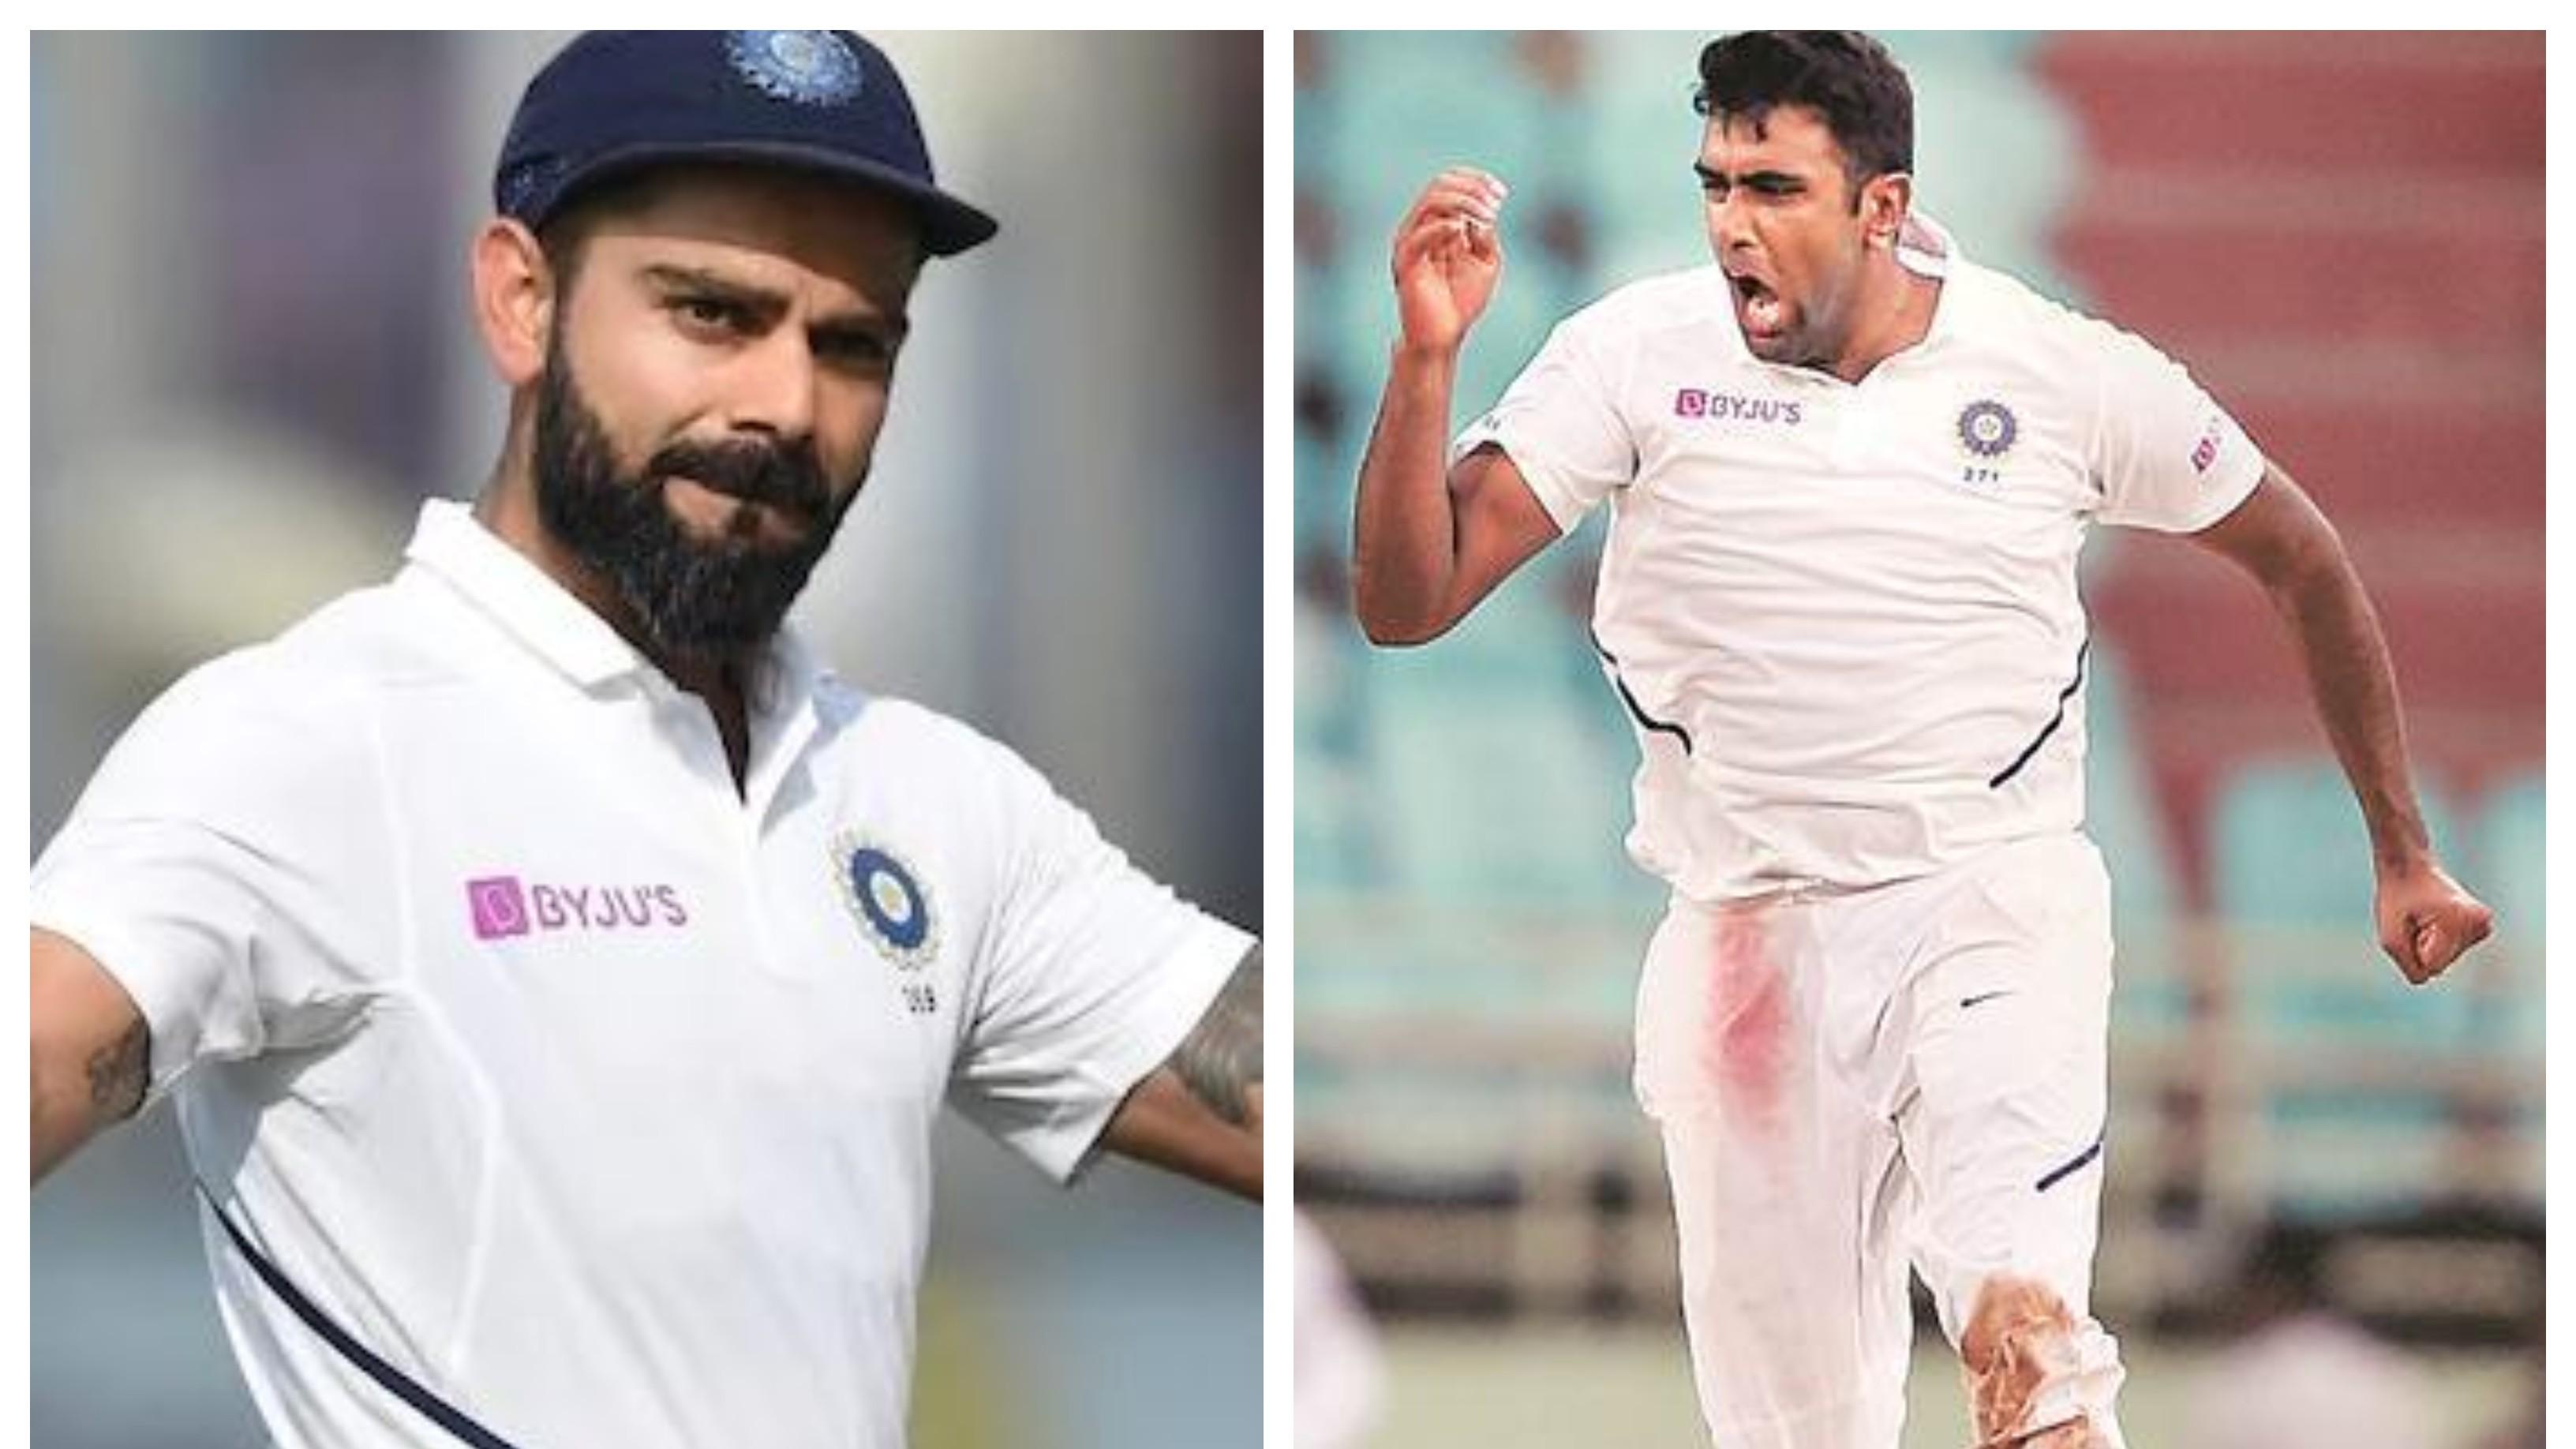 IND v SA 2019: Virat Kohli, R Ashwin make significant gains in ICC Test rankings